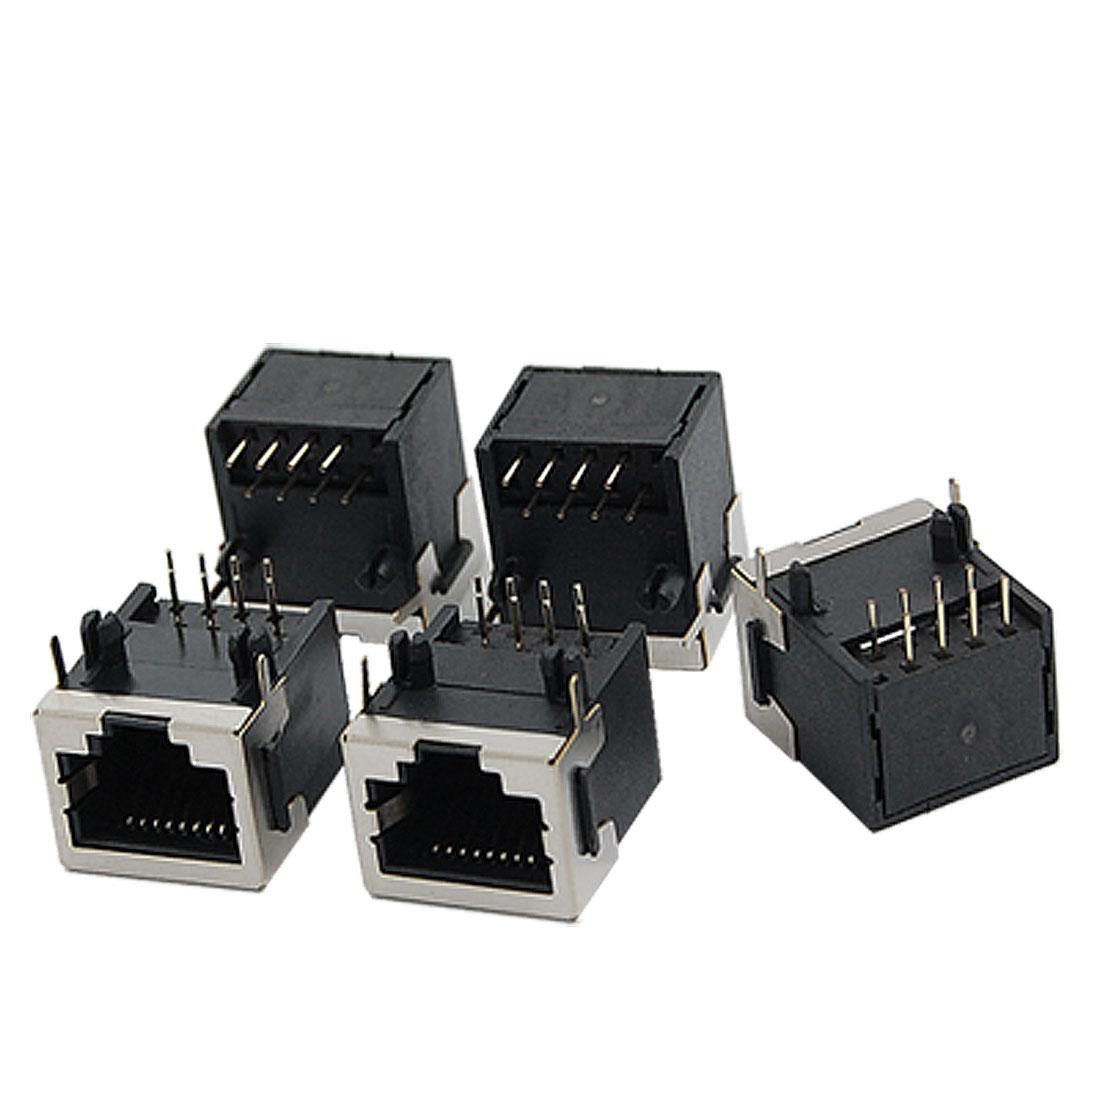 5 Pcs 56-8P8C Half Shielded 8 Round Pin Network Modular PCB Connectors